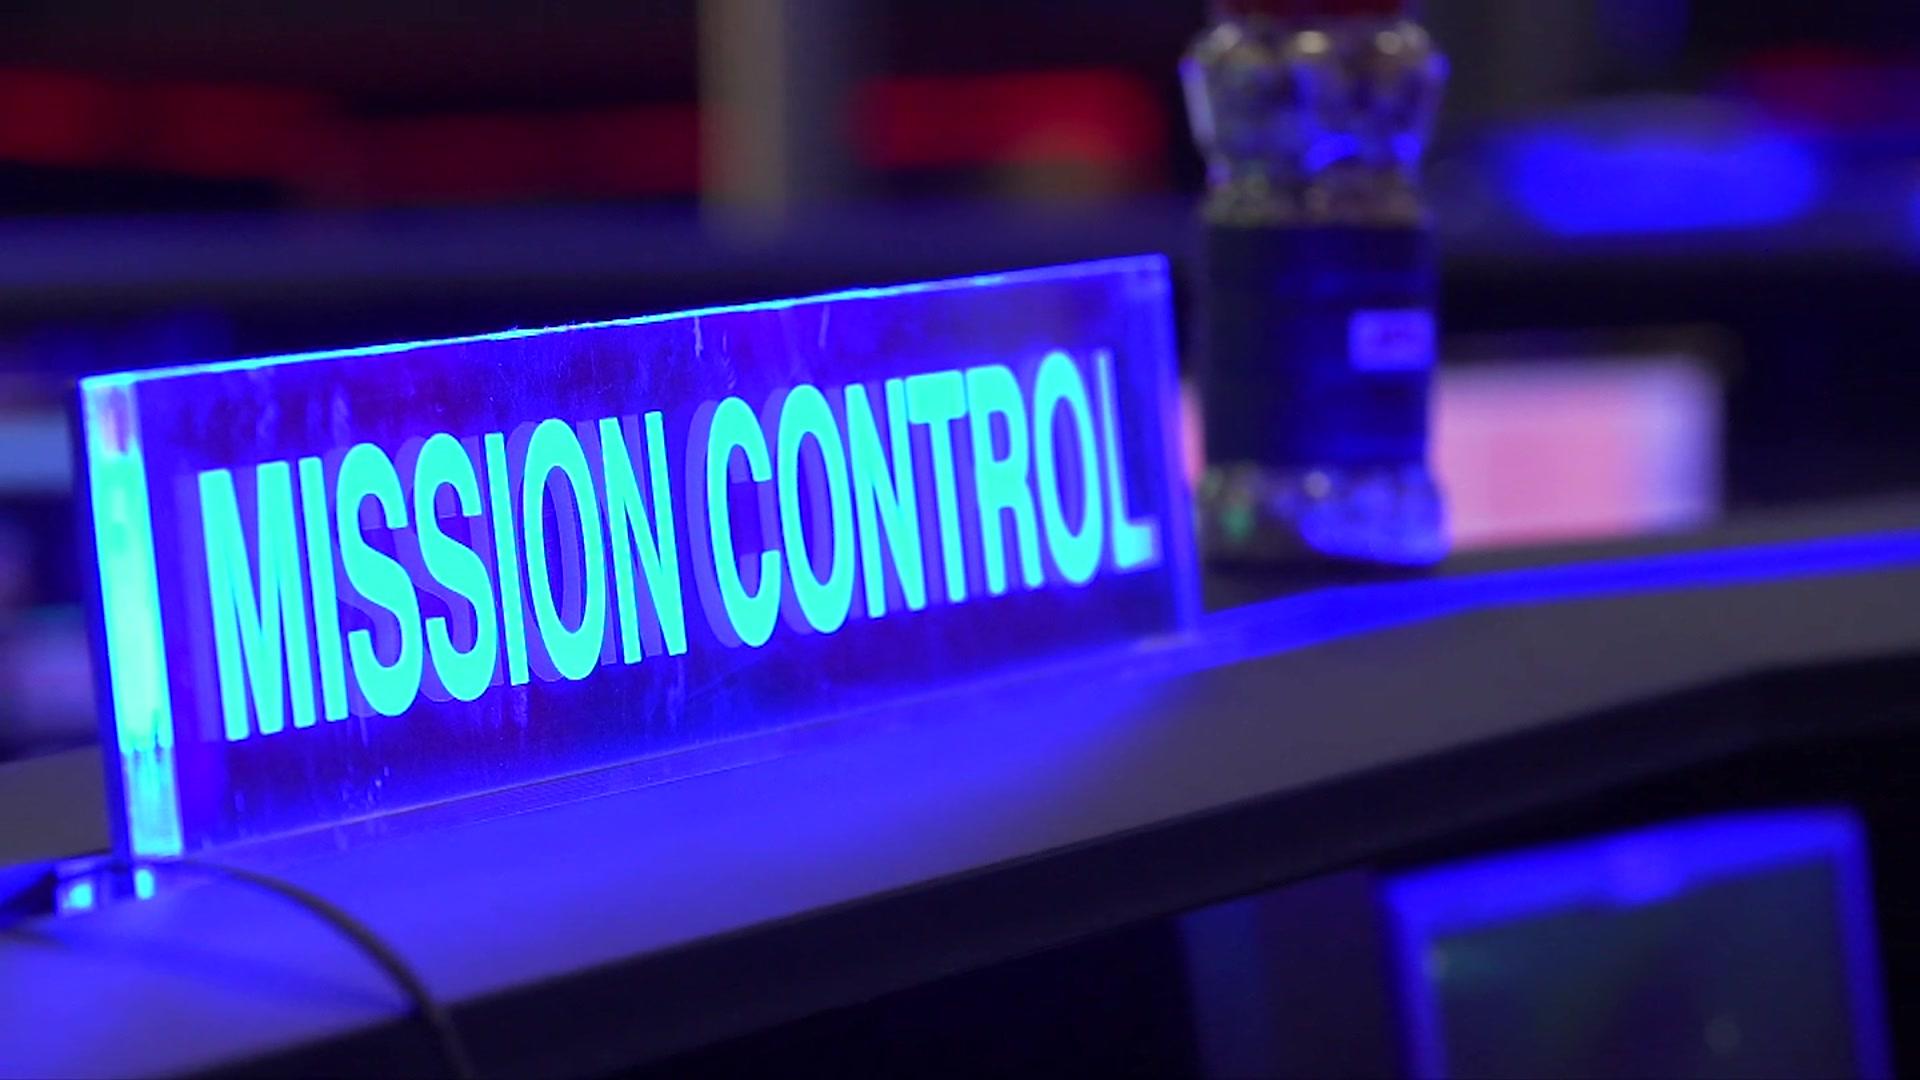 Mars InSight: Inside Nasa's mission control